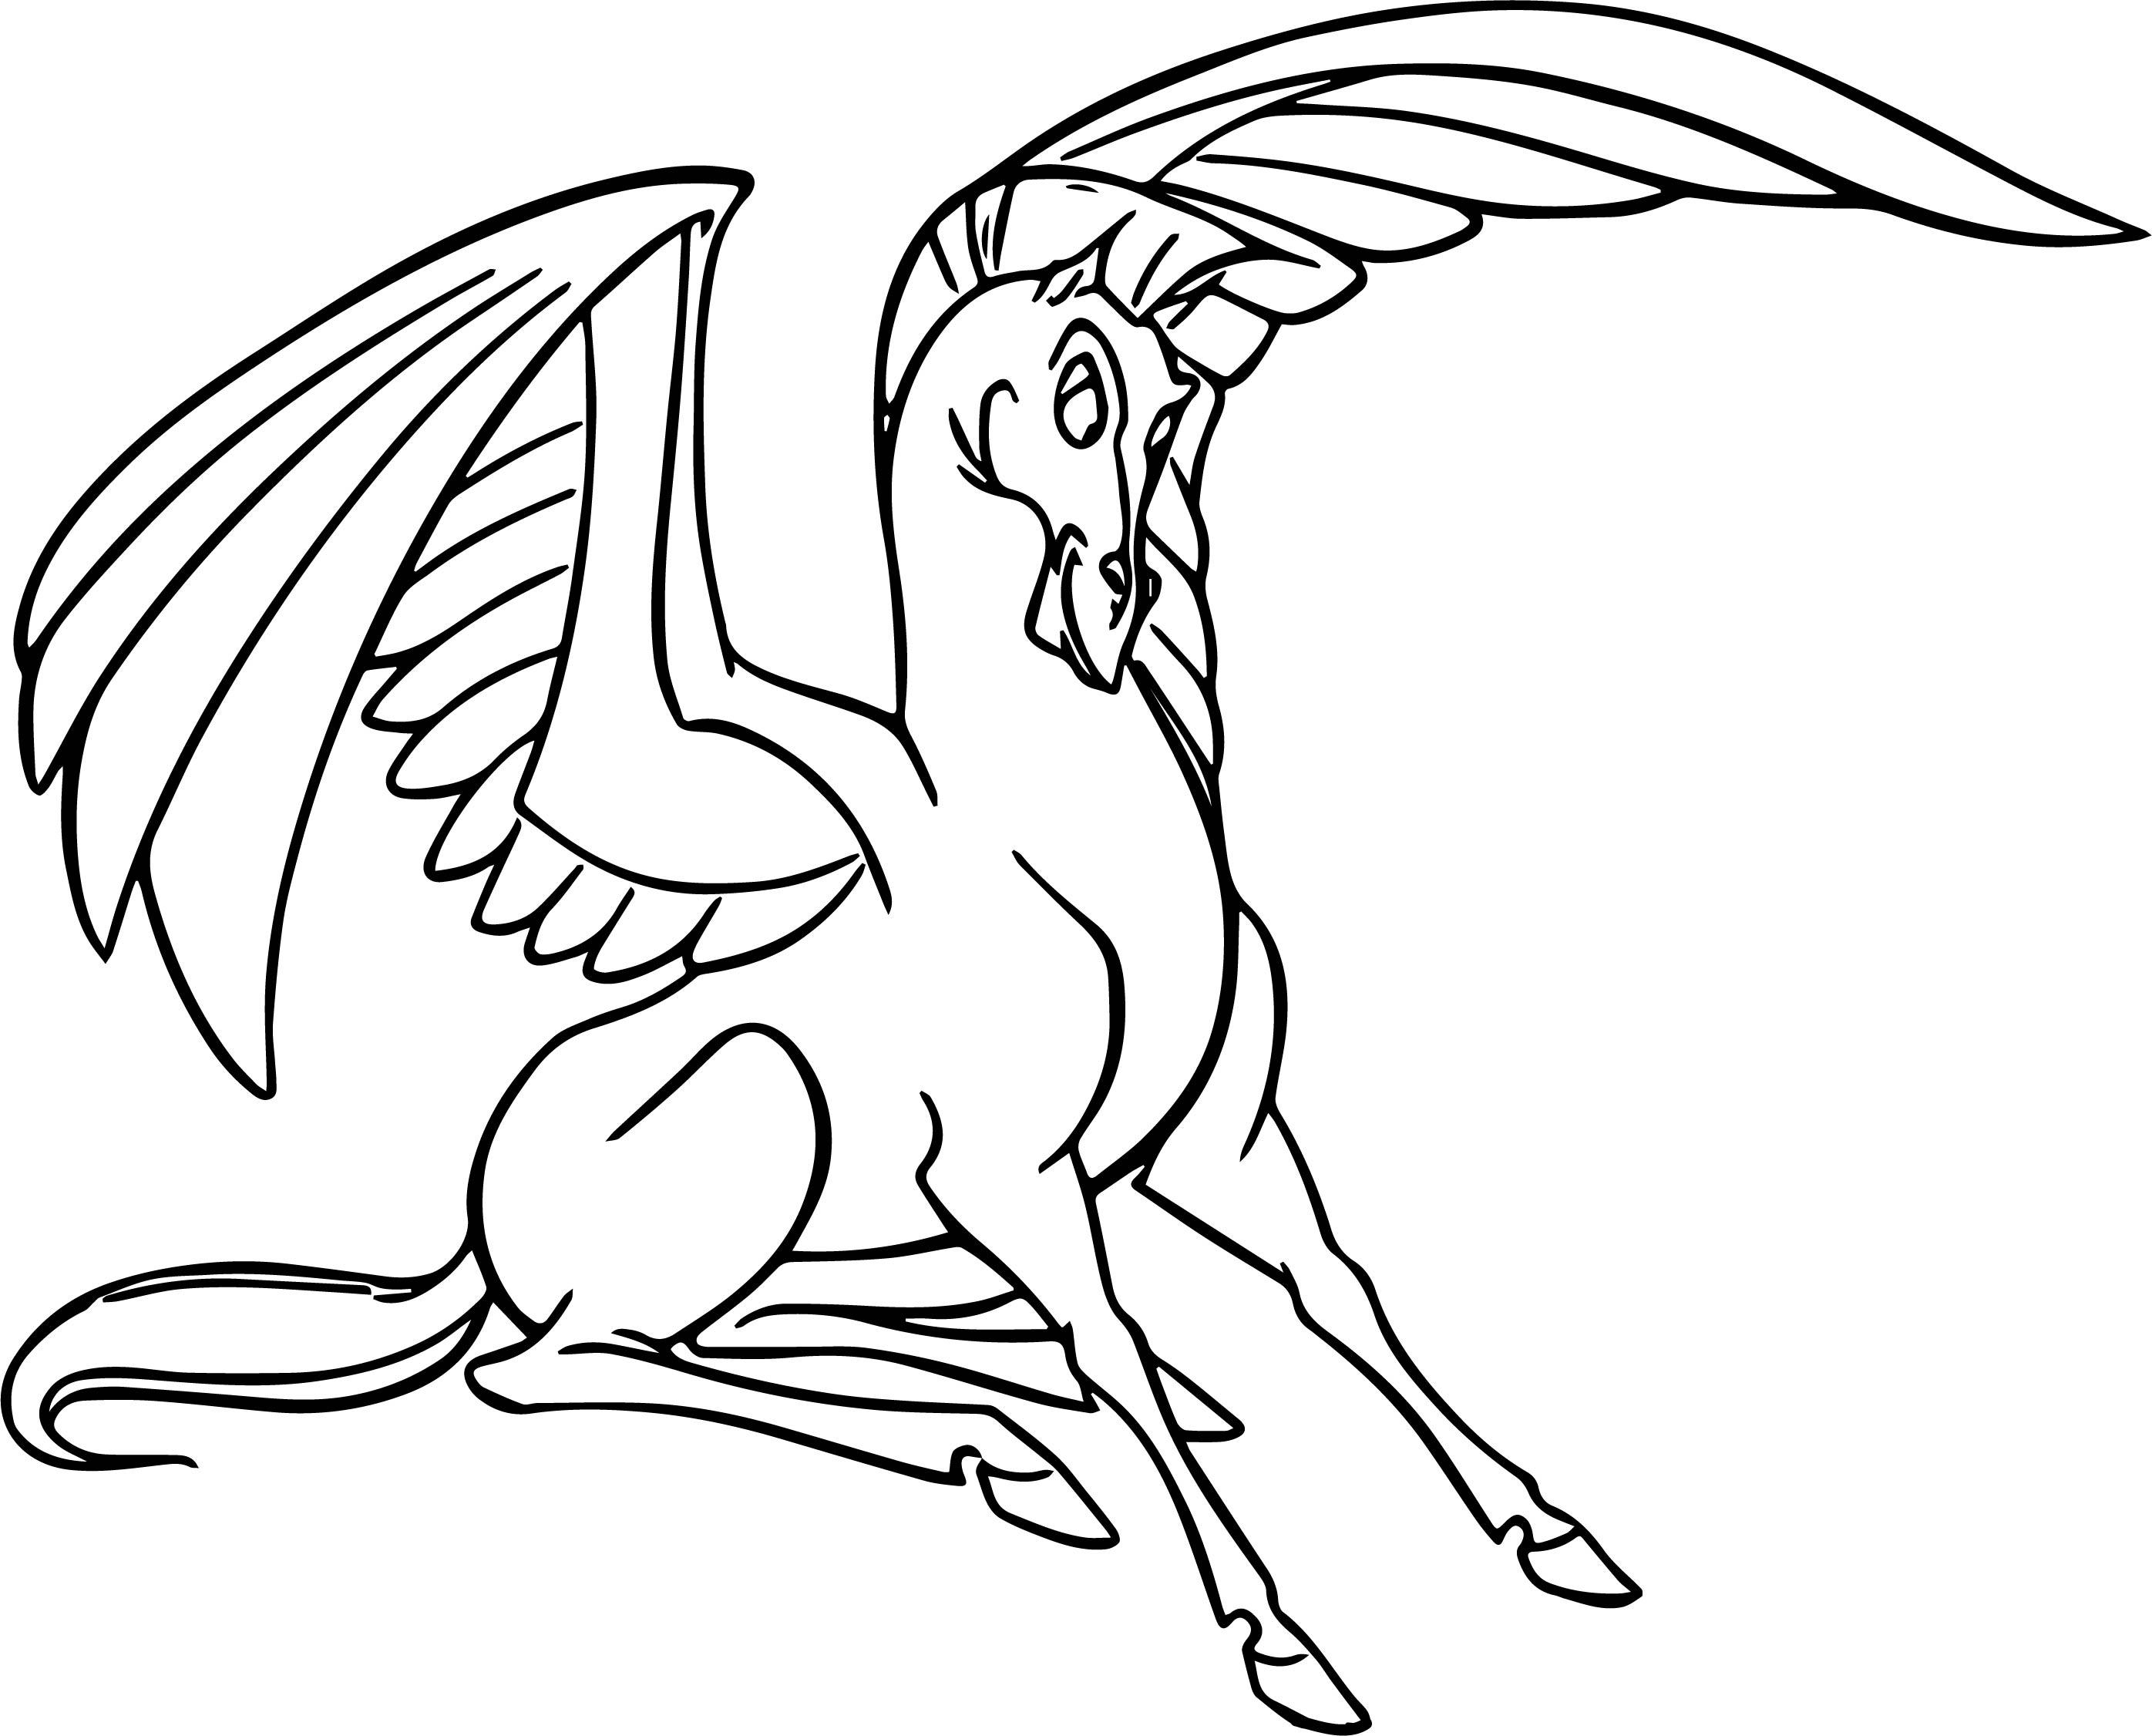 Hercules And Pegasus Coloring Pages 07